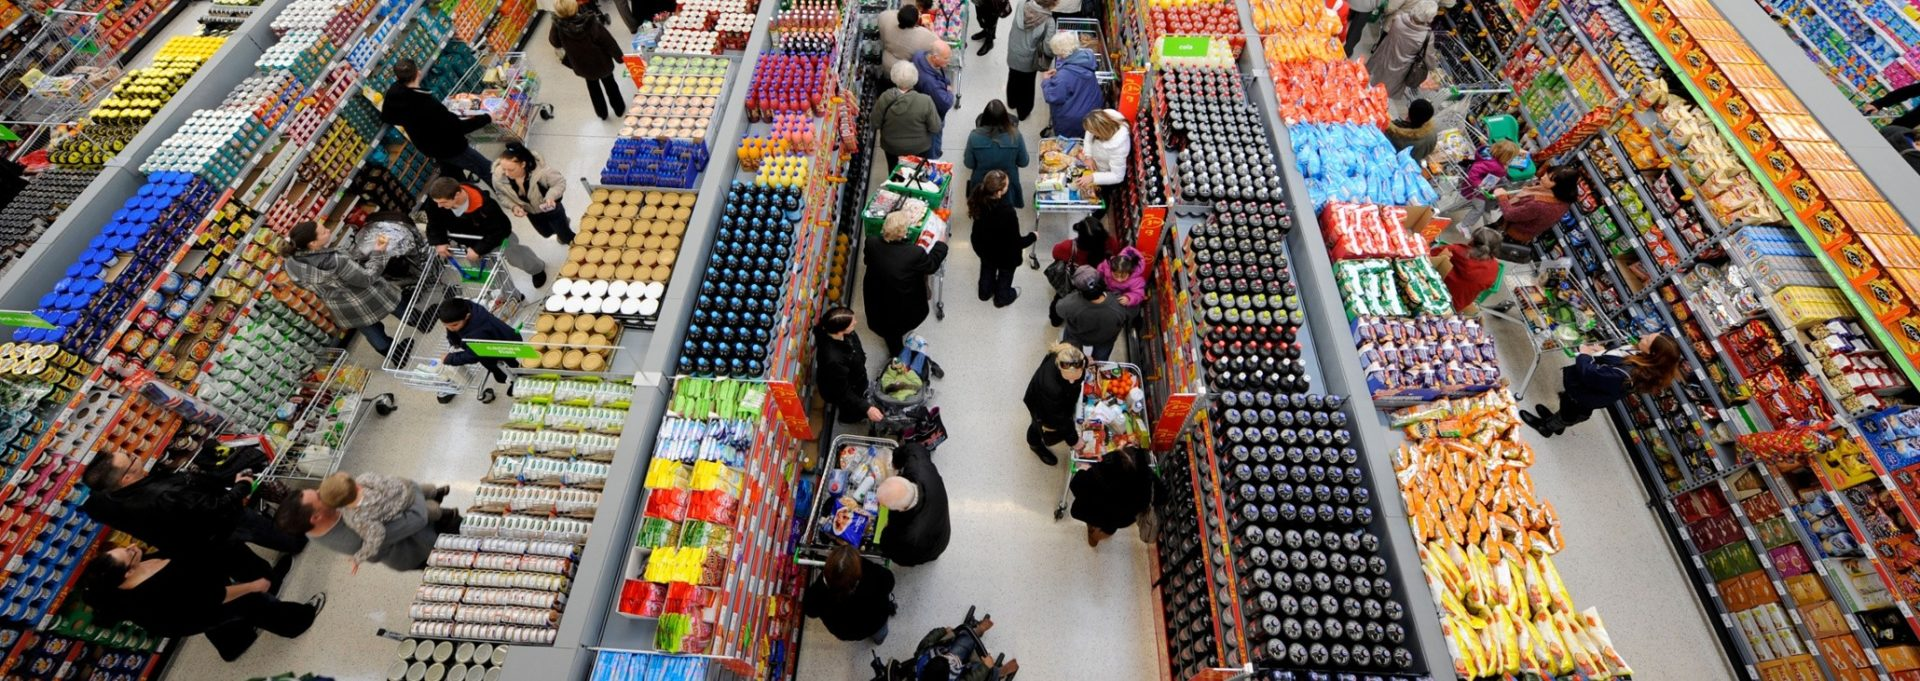 Visual of Supermarket